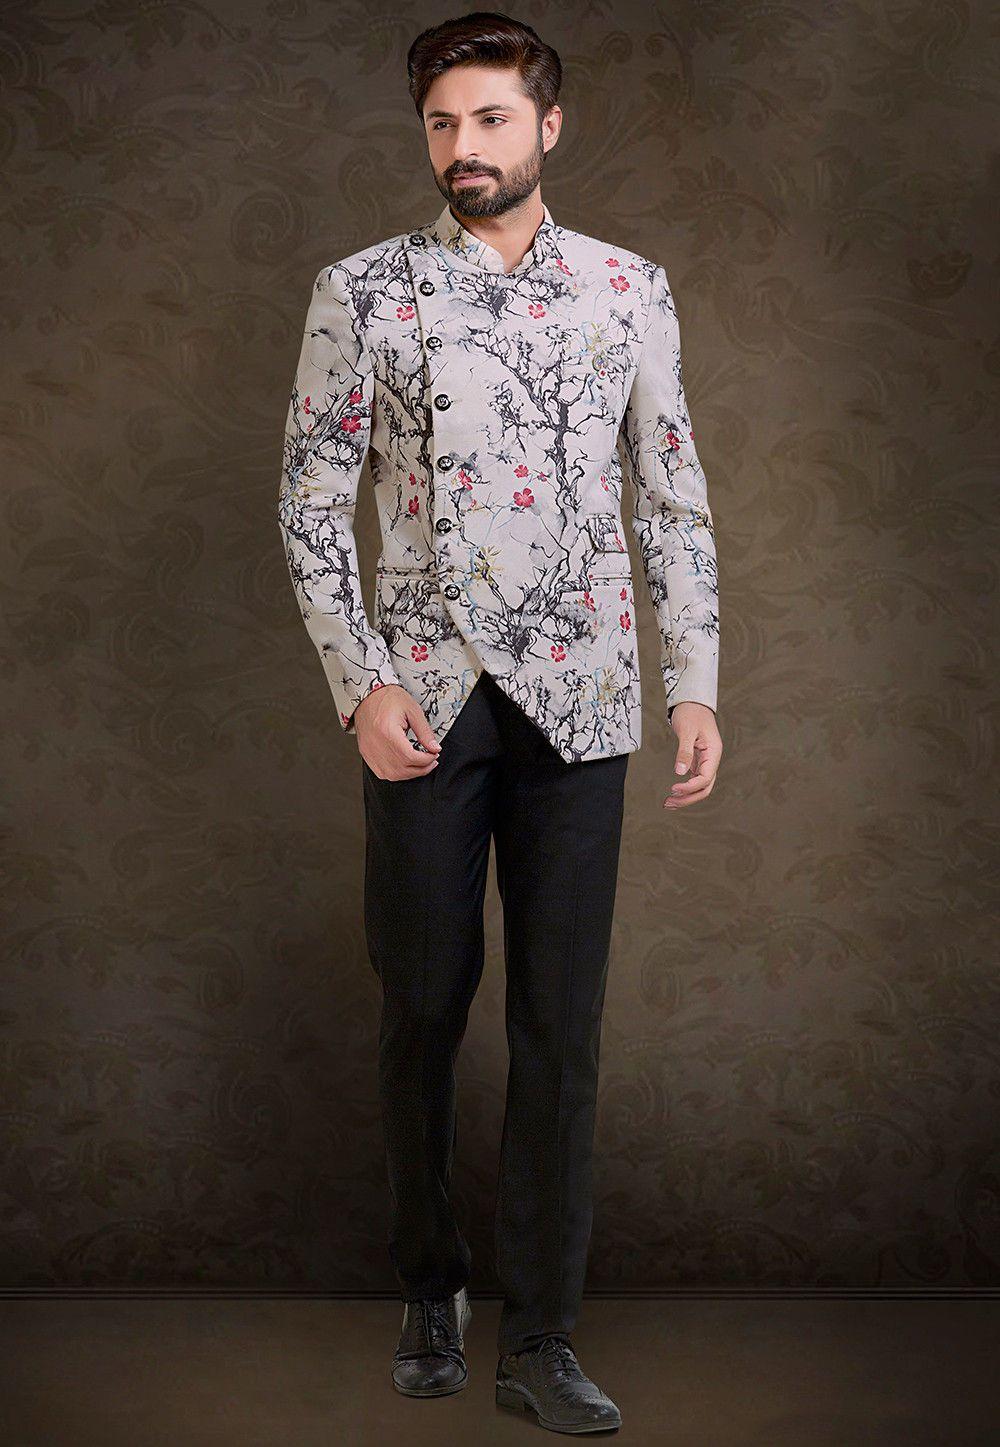 Velvet Jodhpuri Suit In Light Fawn This Readymade Attire